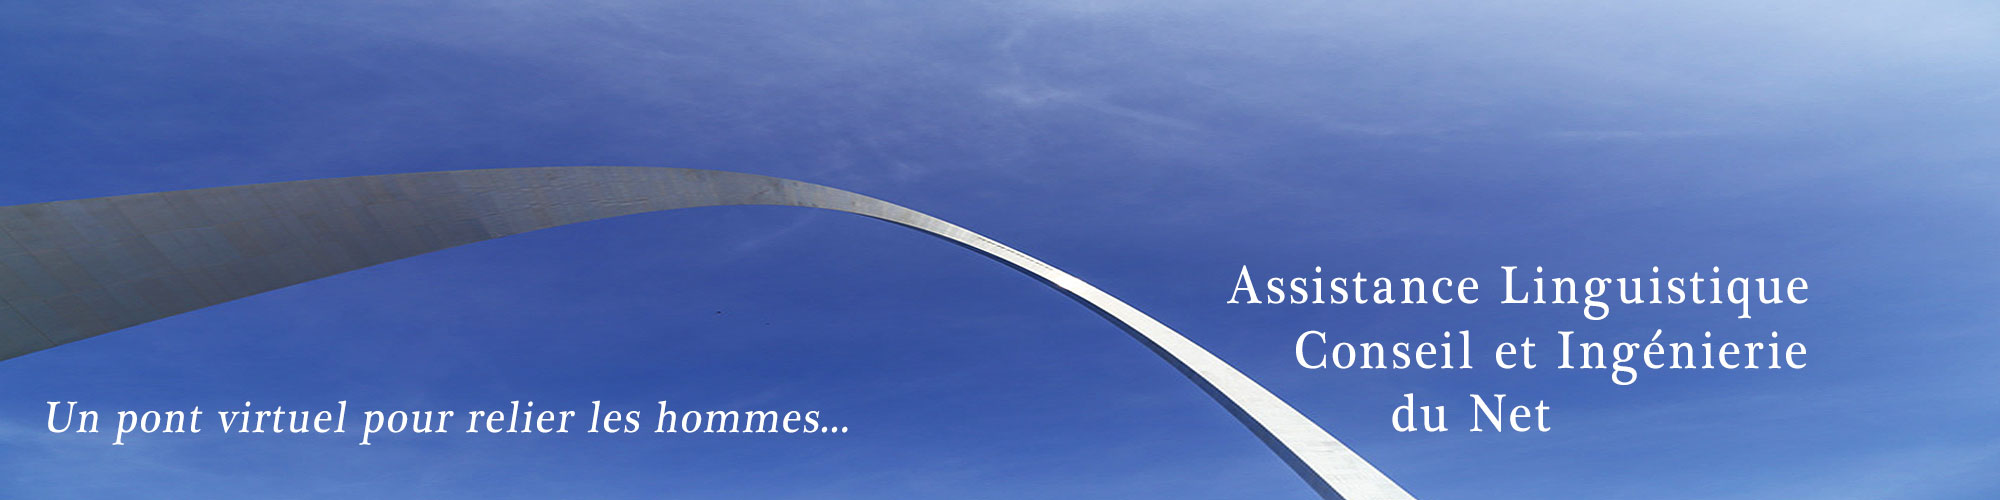 ALCINET Page d'accueil